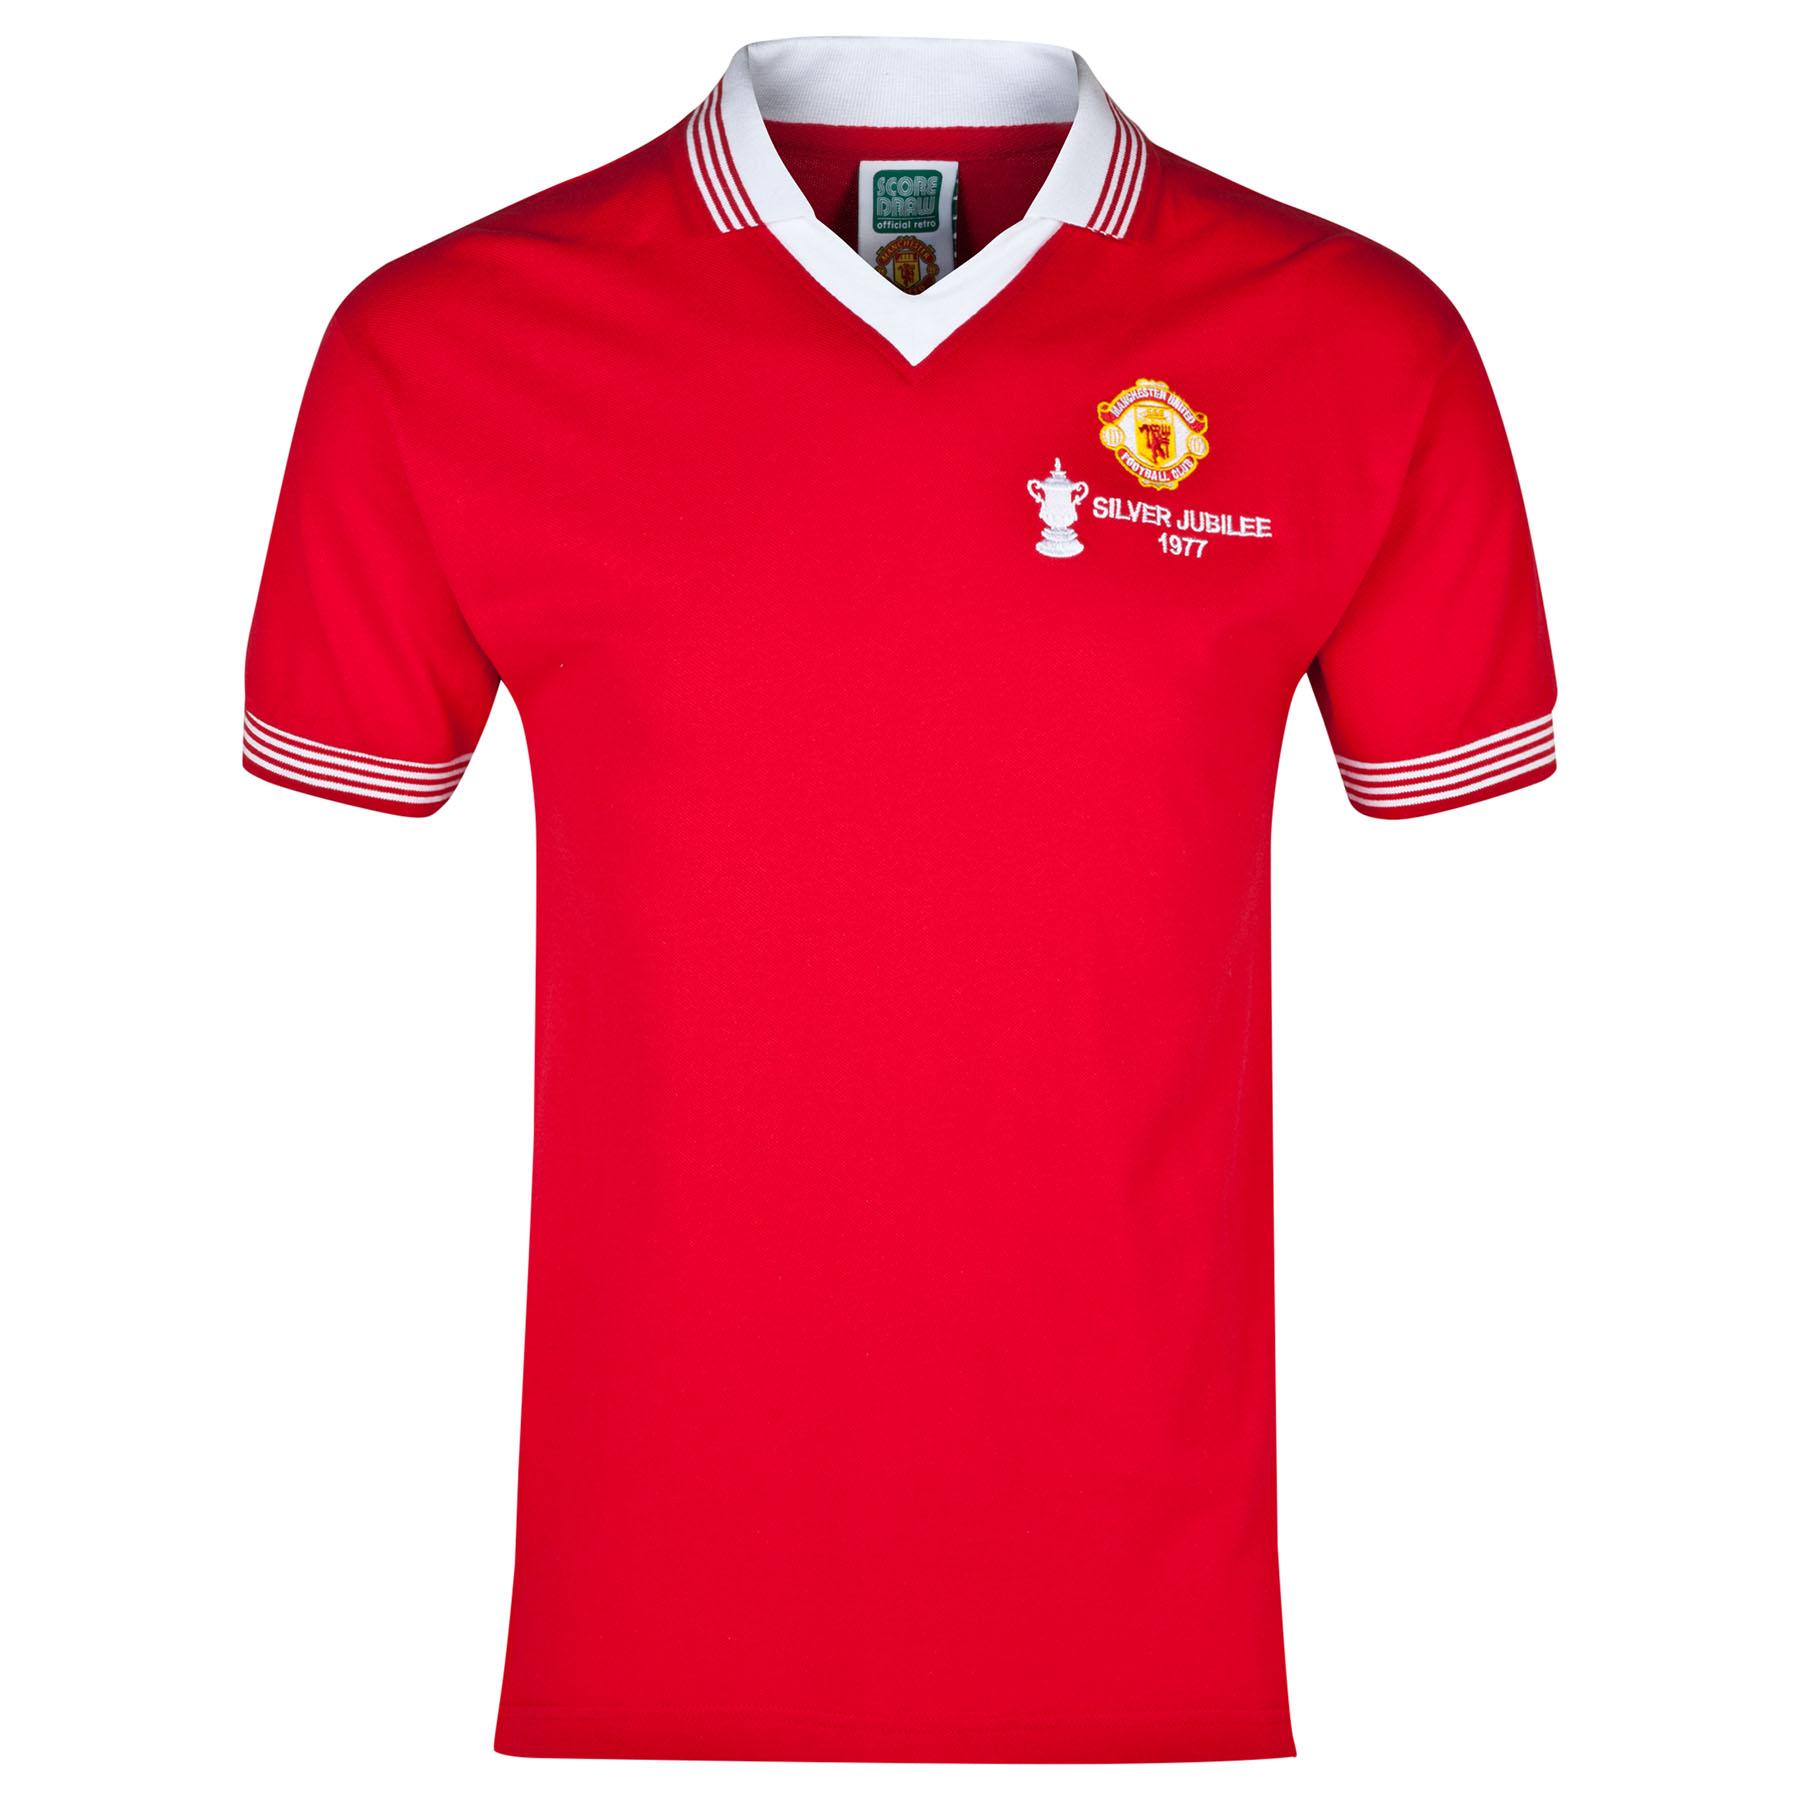 Manchester United 1977 Retro Home Shirt - Red